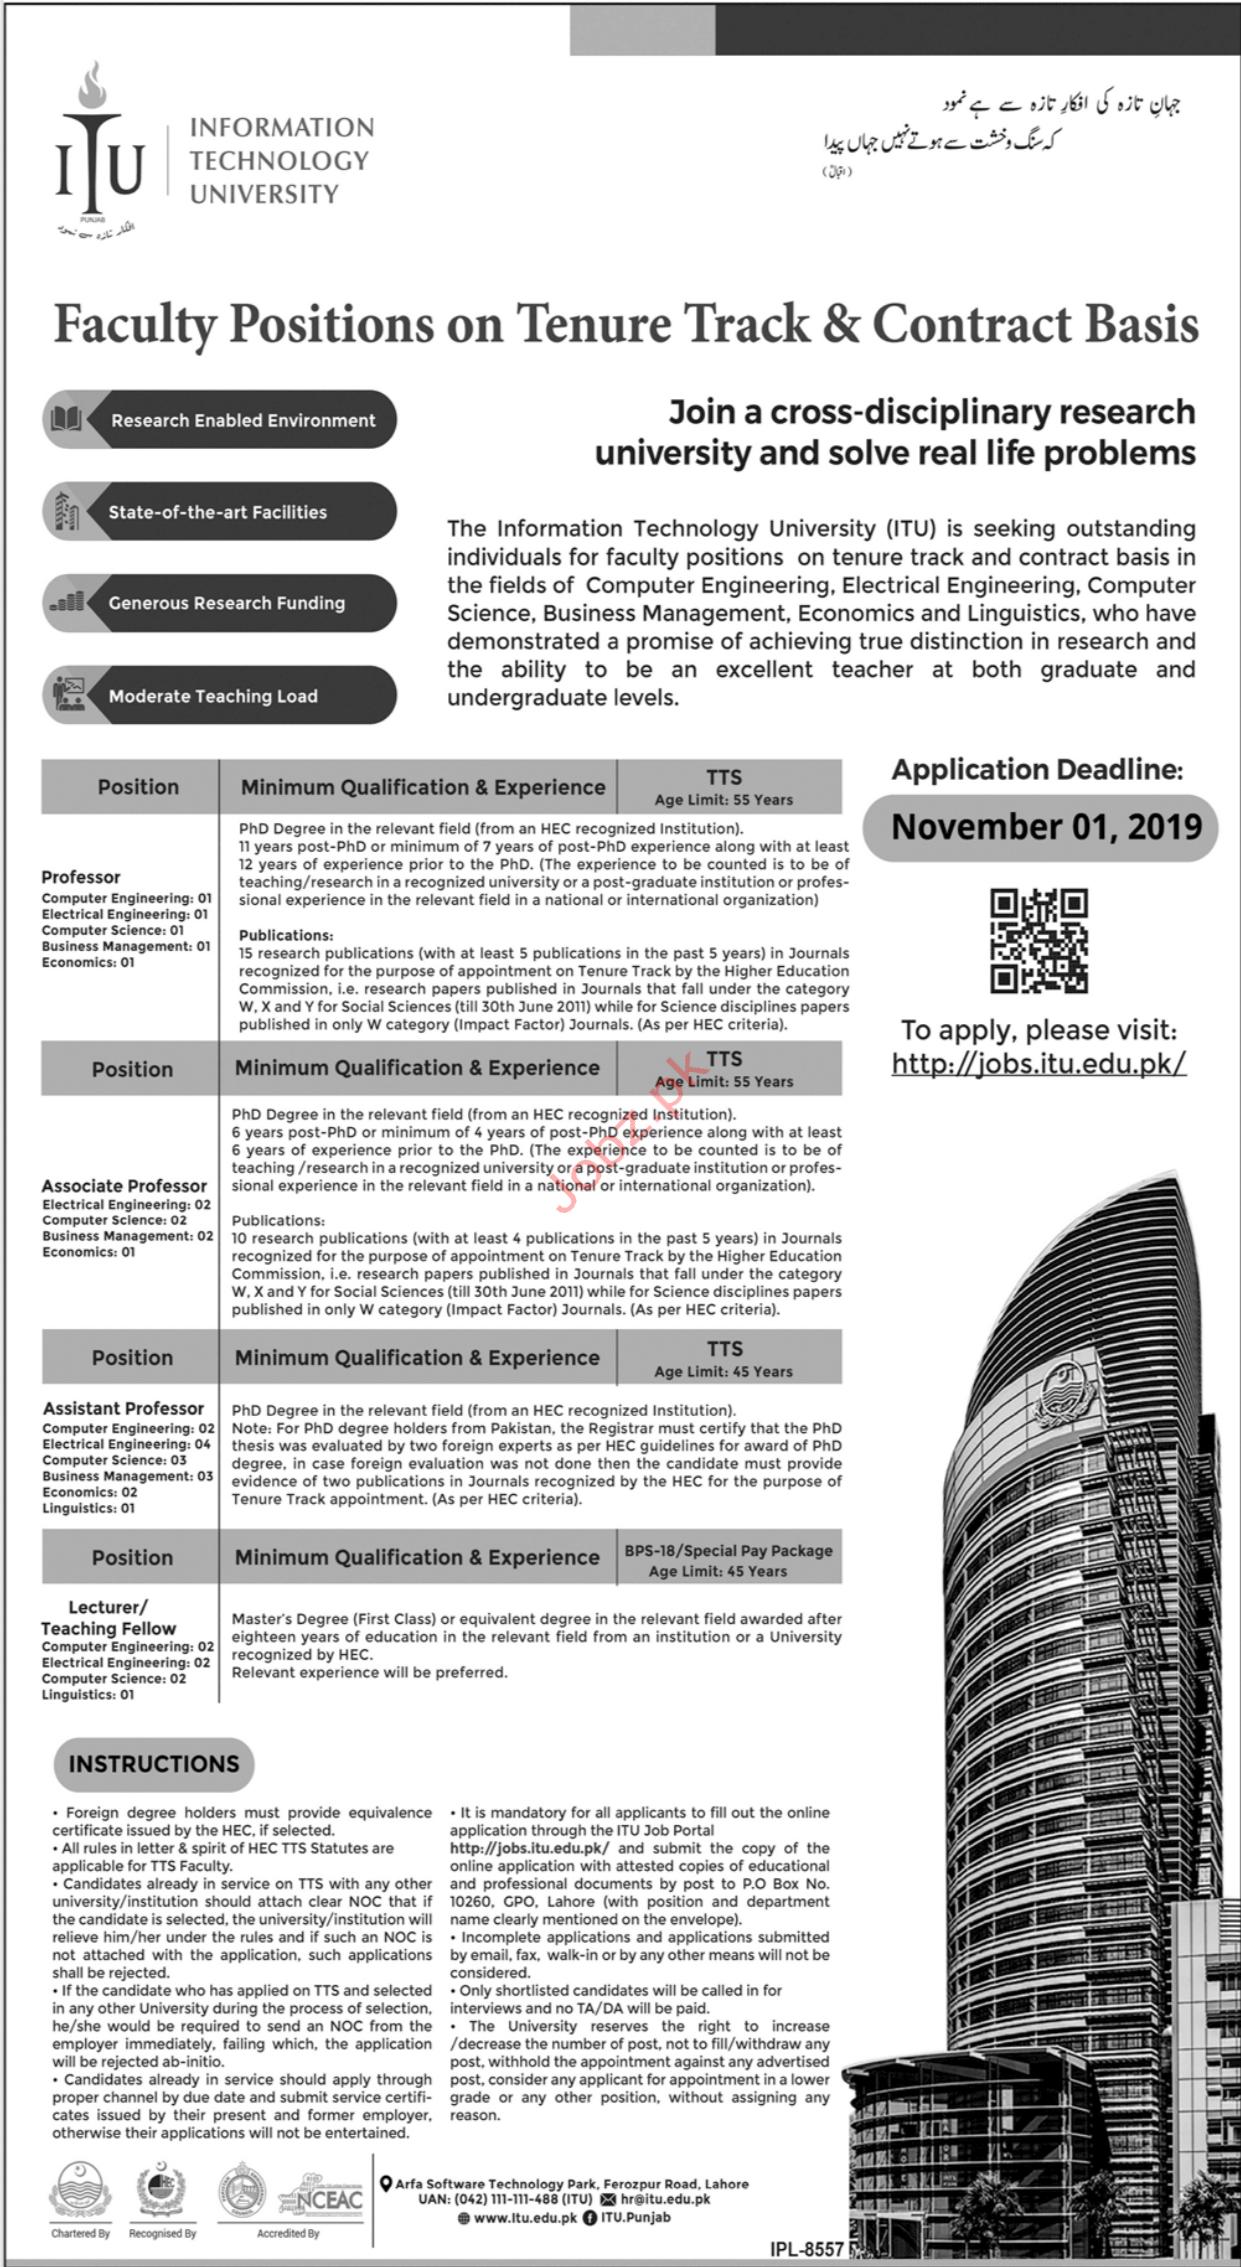 Information Technology University ITU Professor Jobs